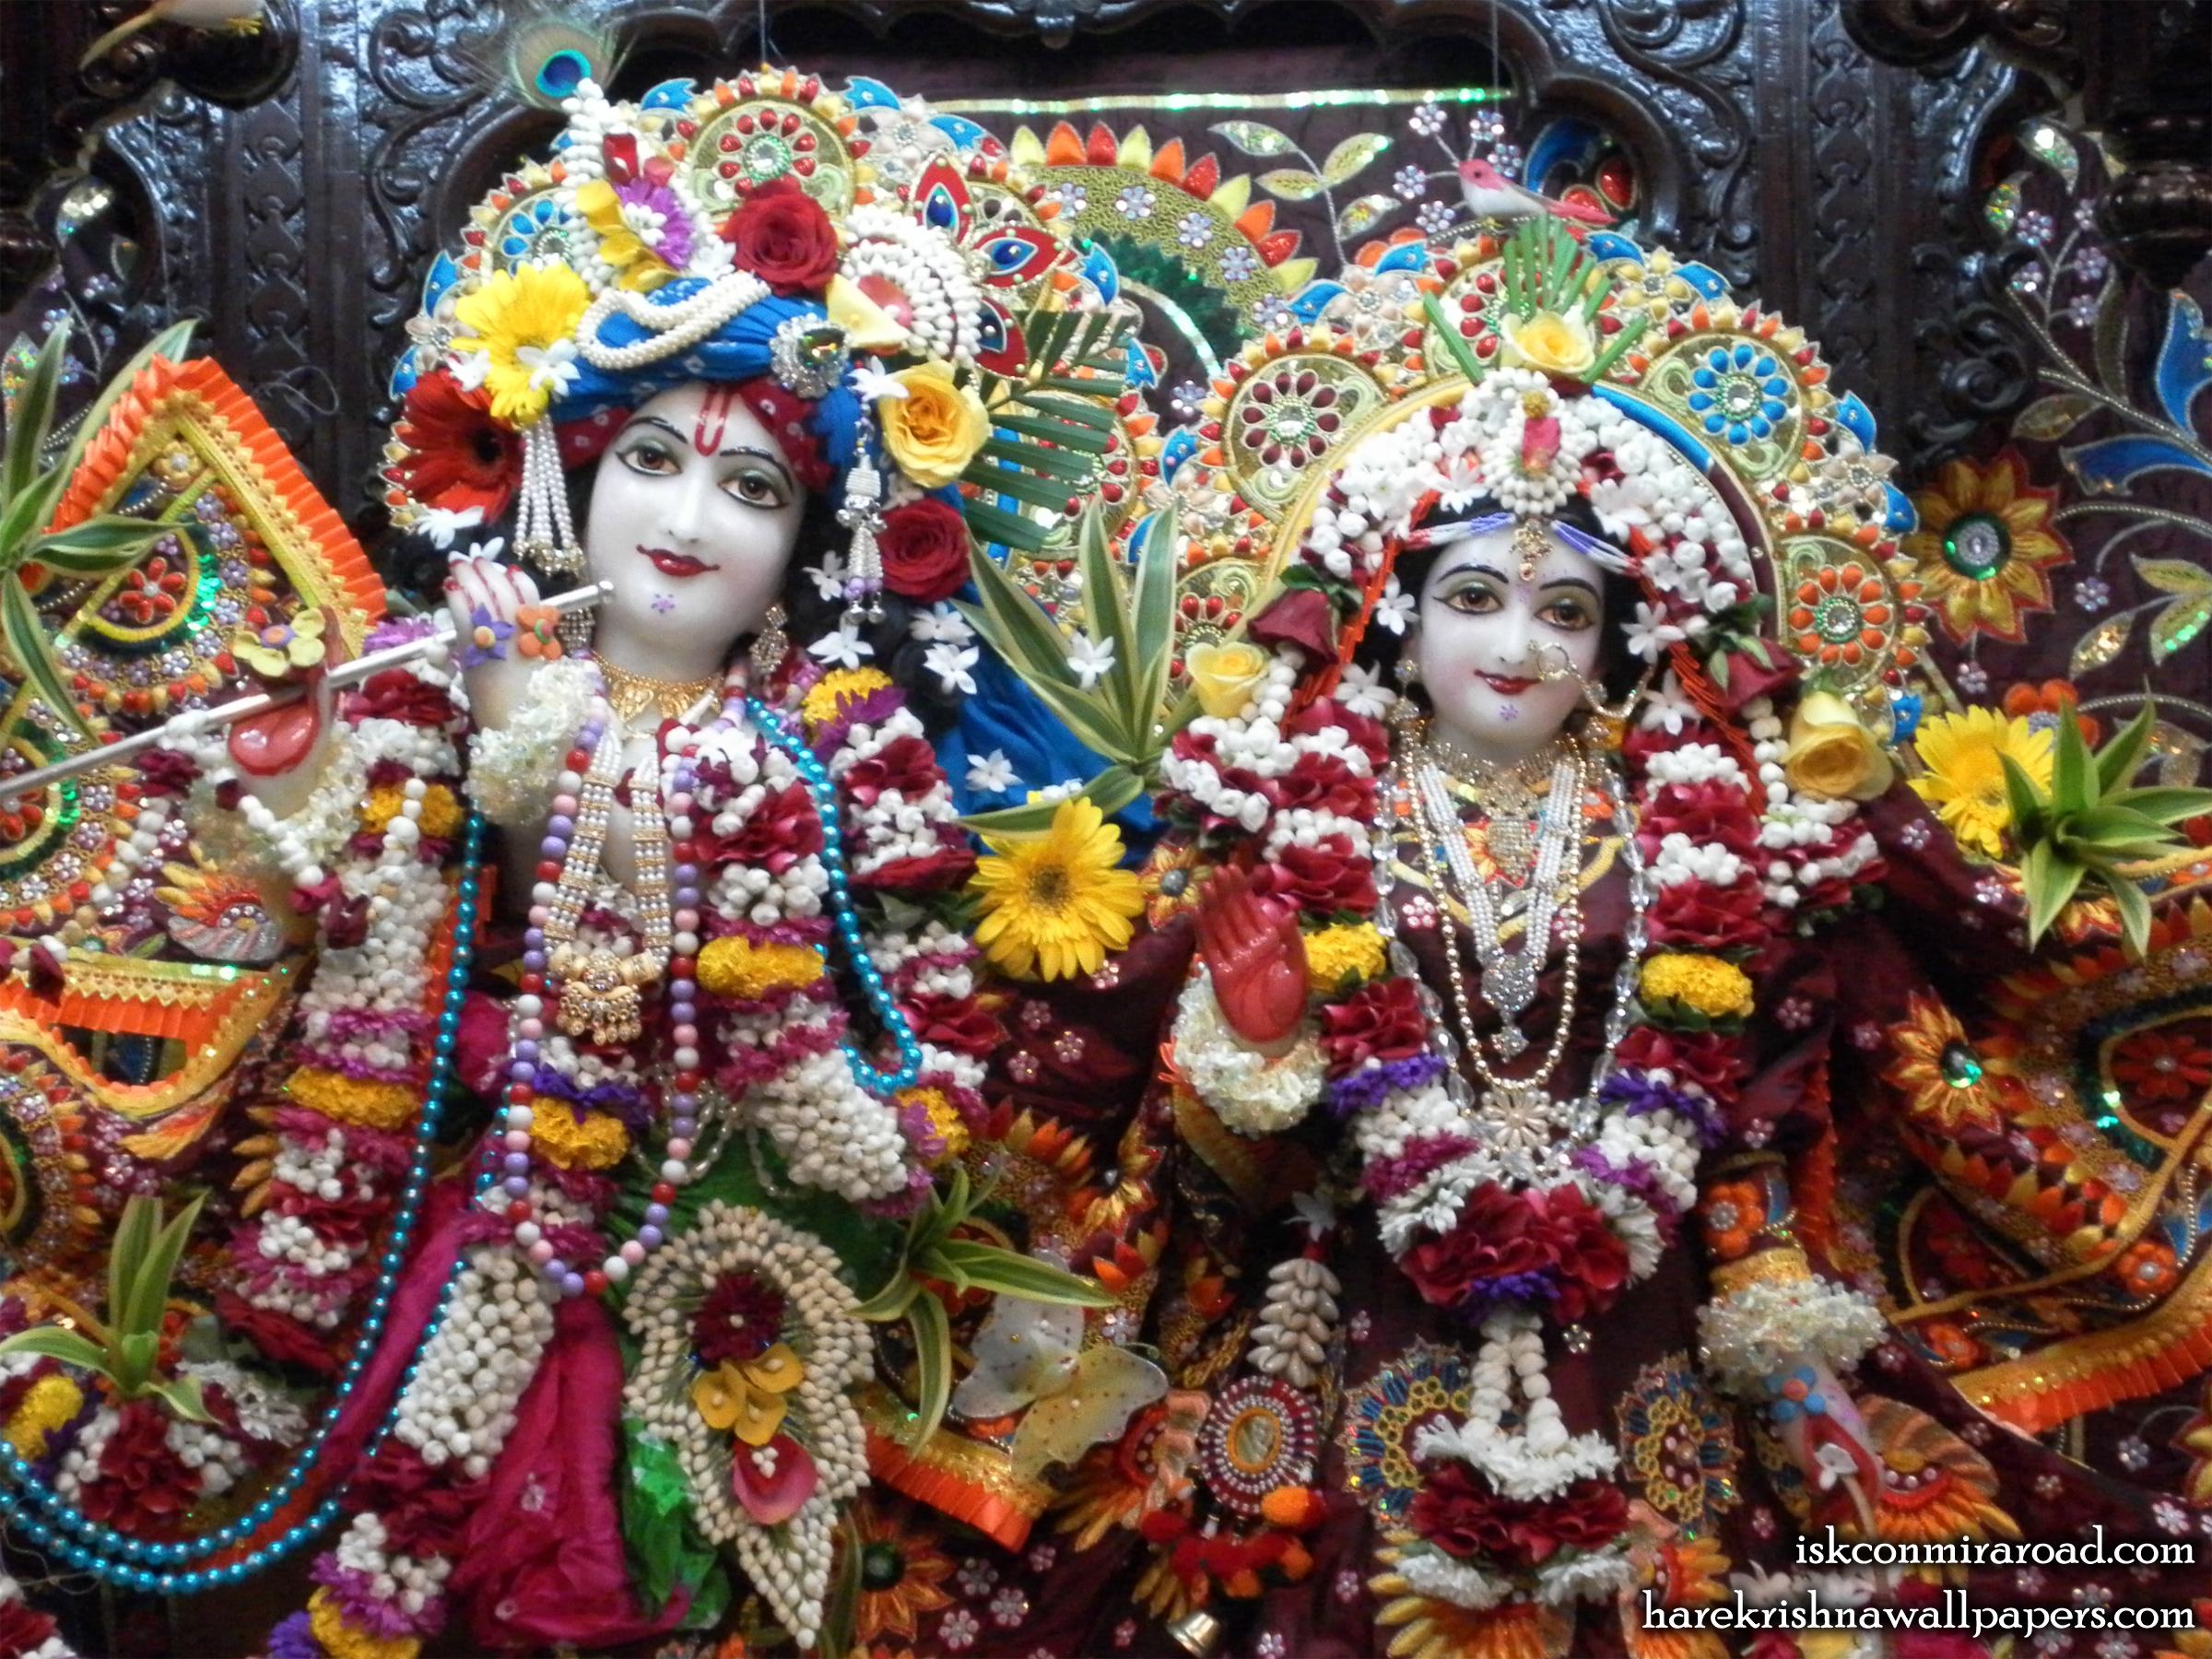 Sri Sri Radha Giridhari Close up Wallpaper (006) Size 2400x1800 Download